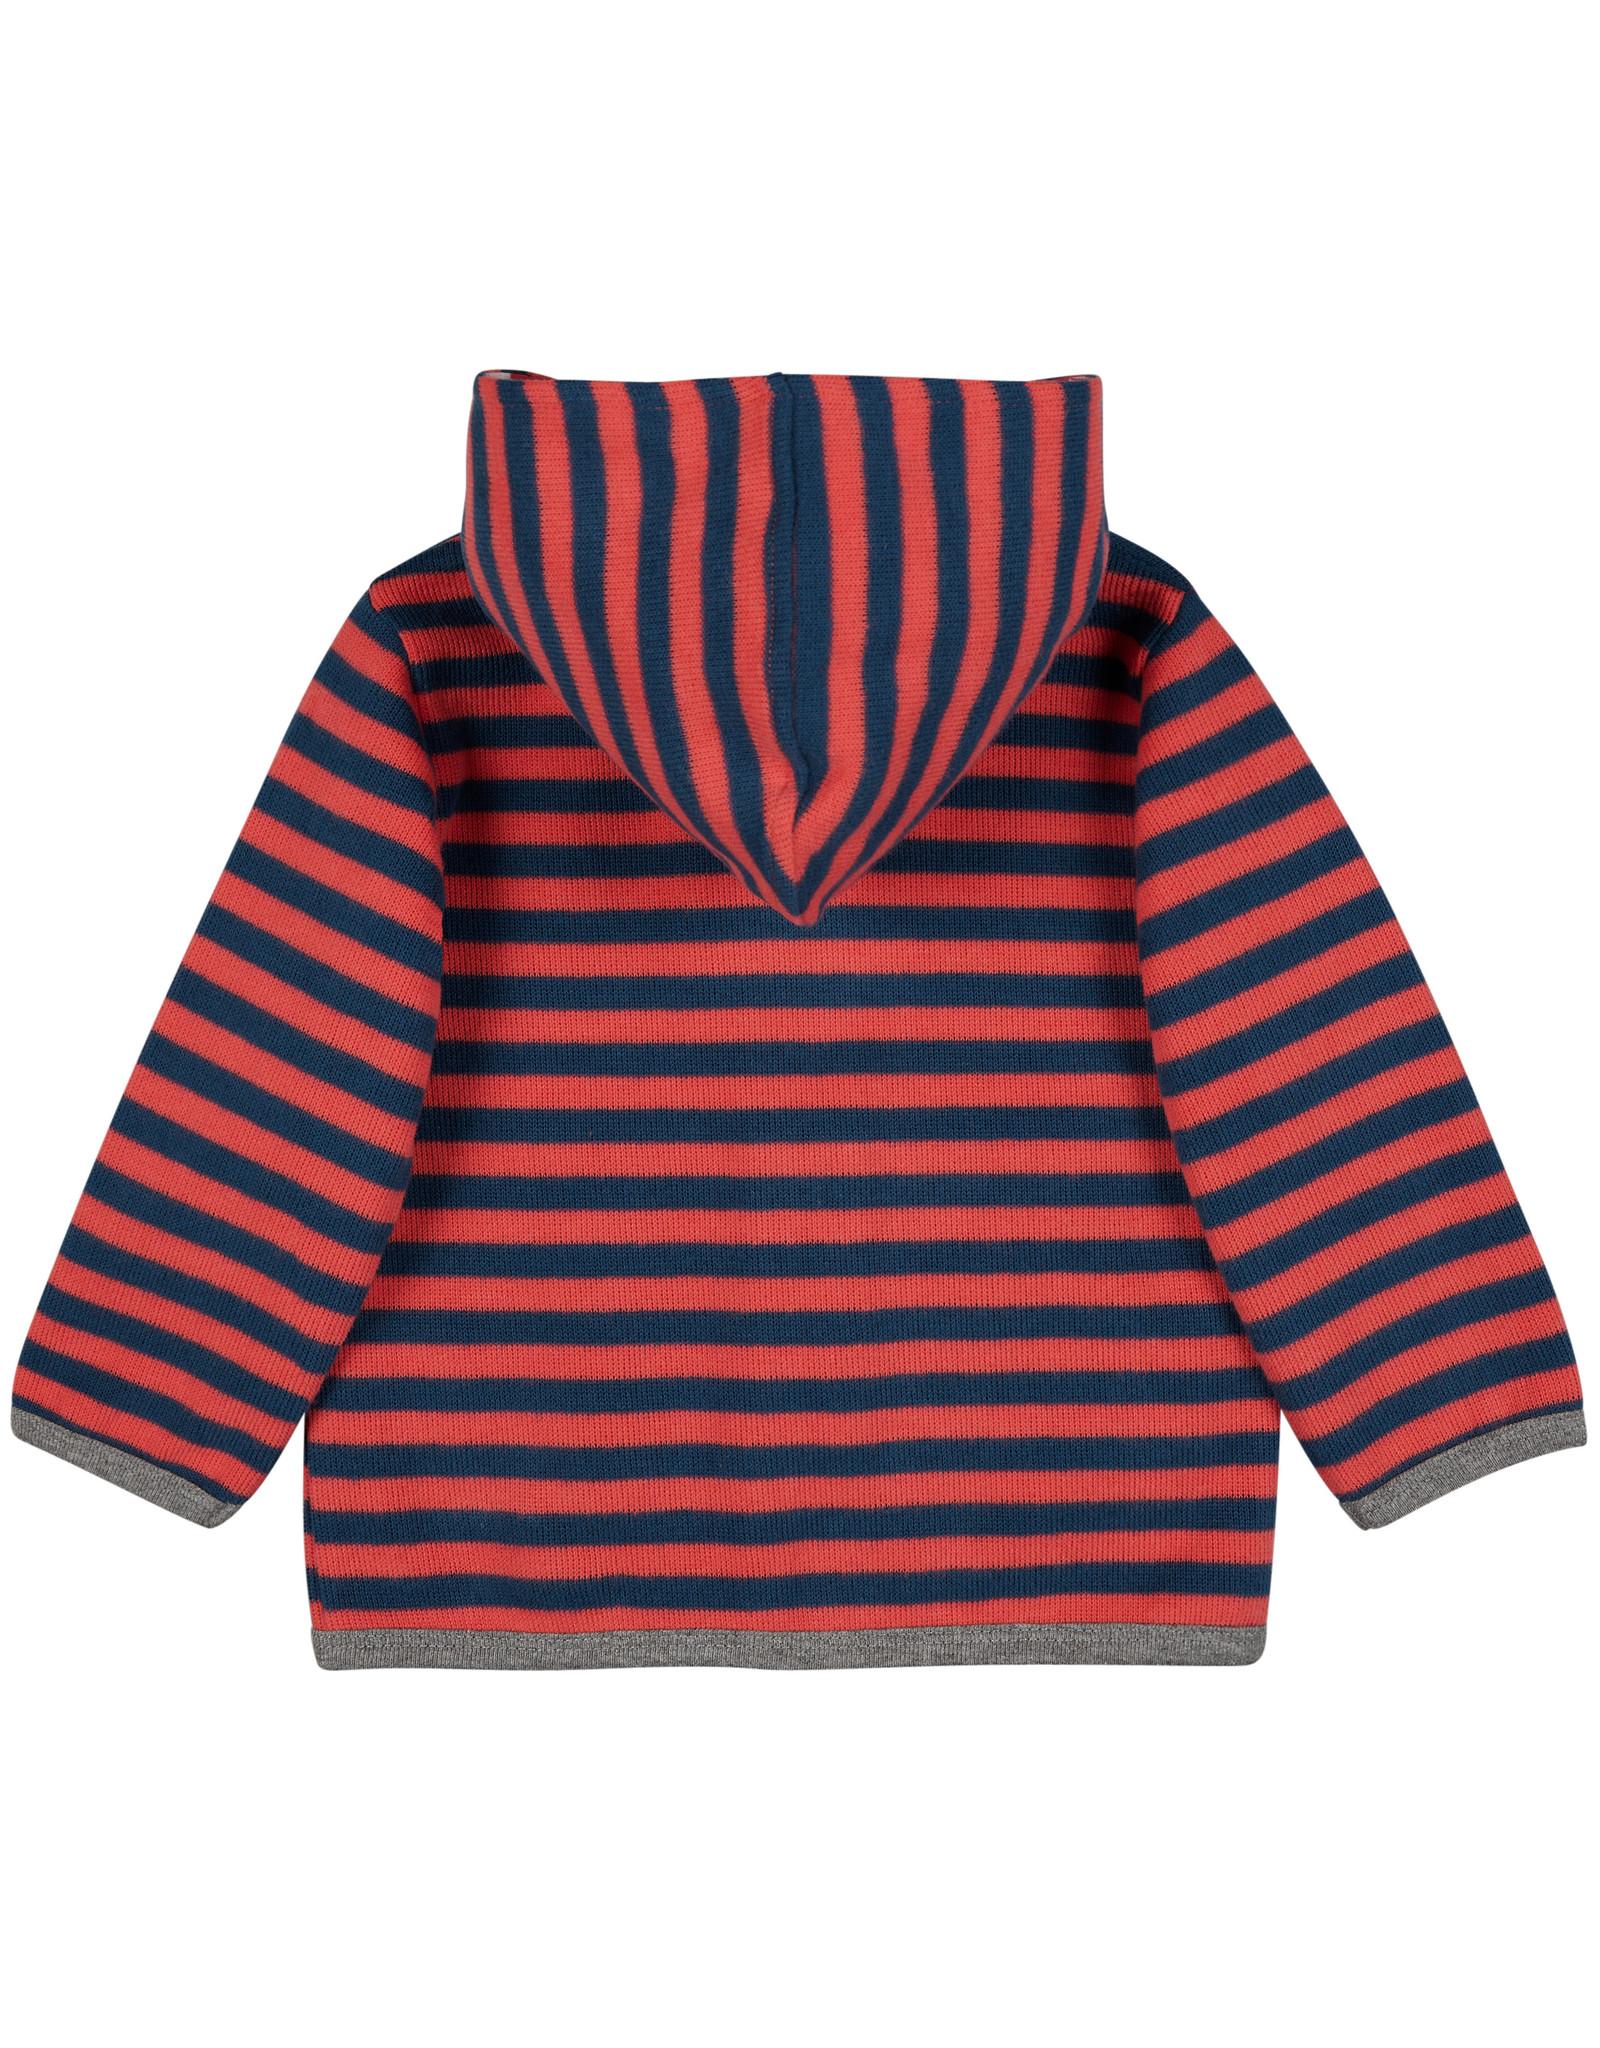 loud+proud Children's coat - red blue striped